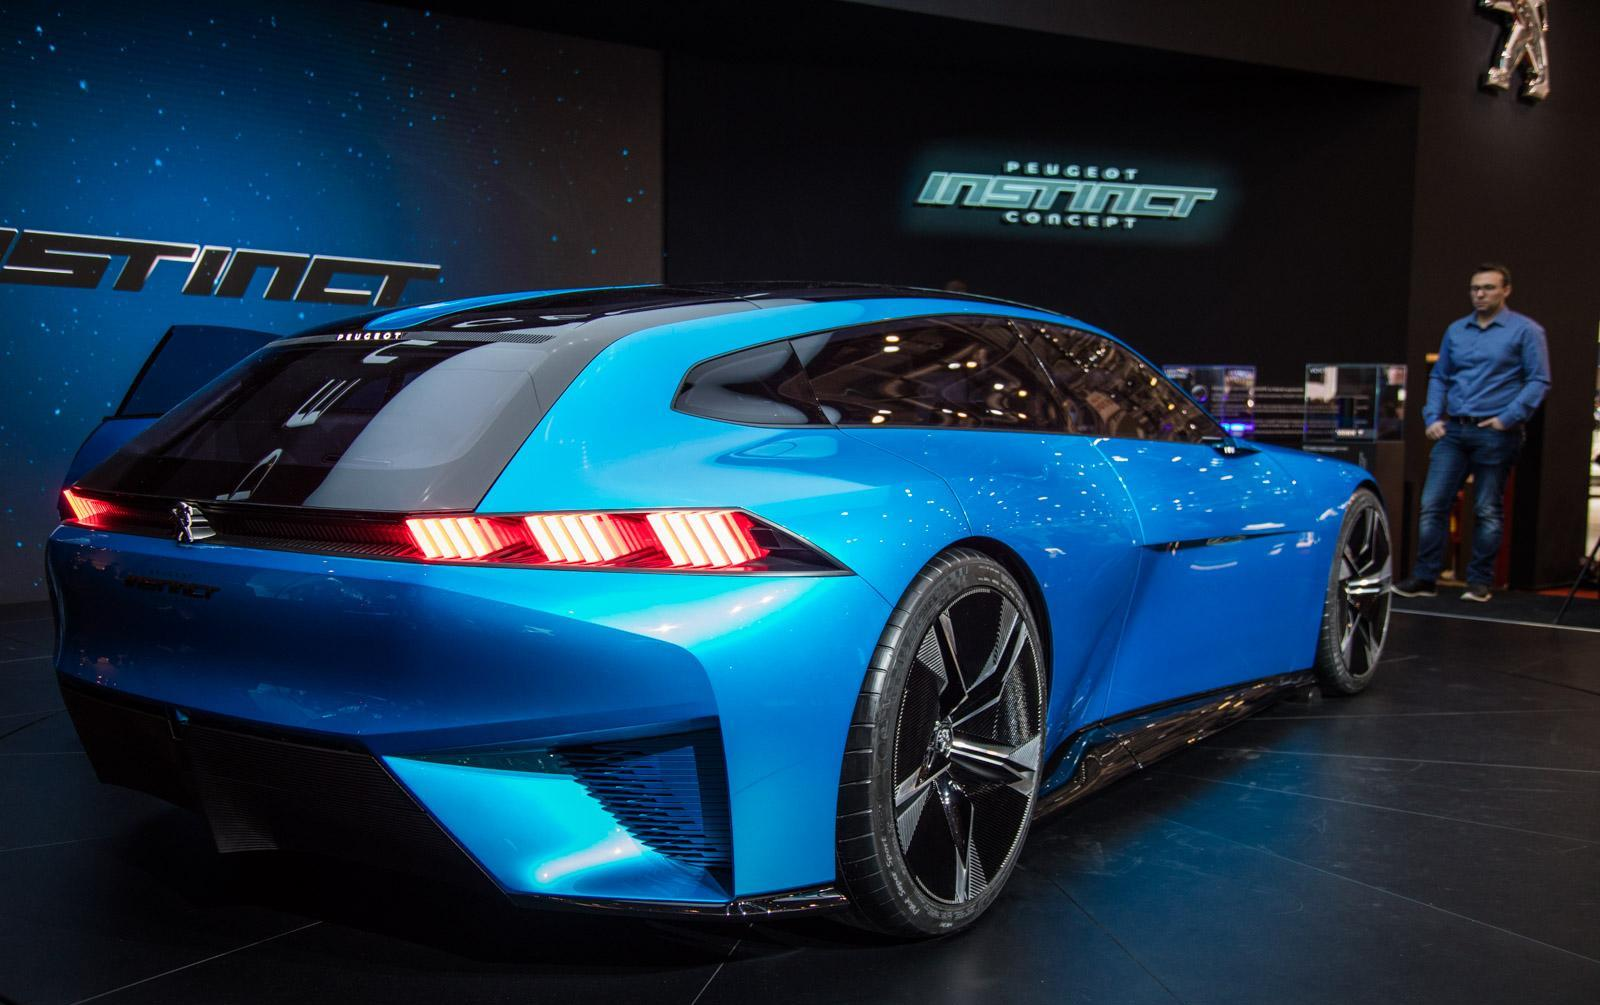 Peugeot-instinct-concept-017